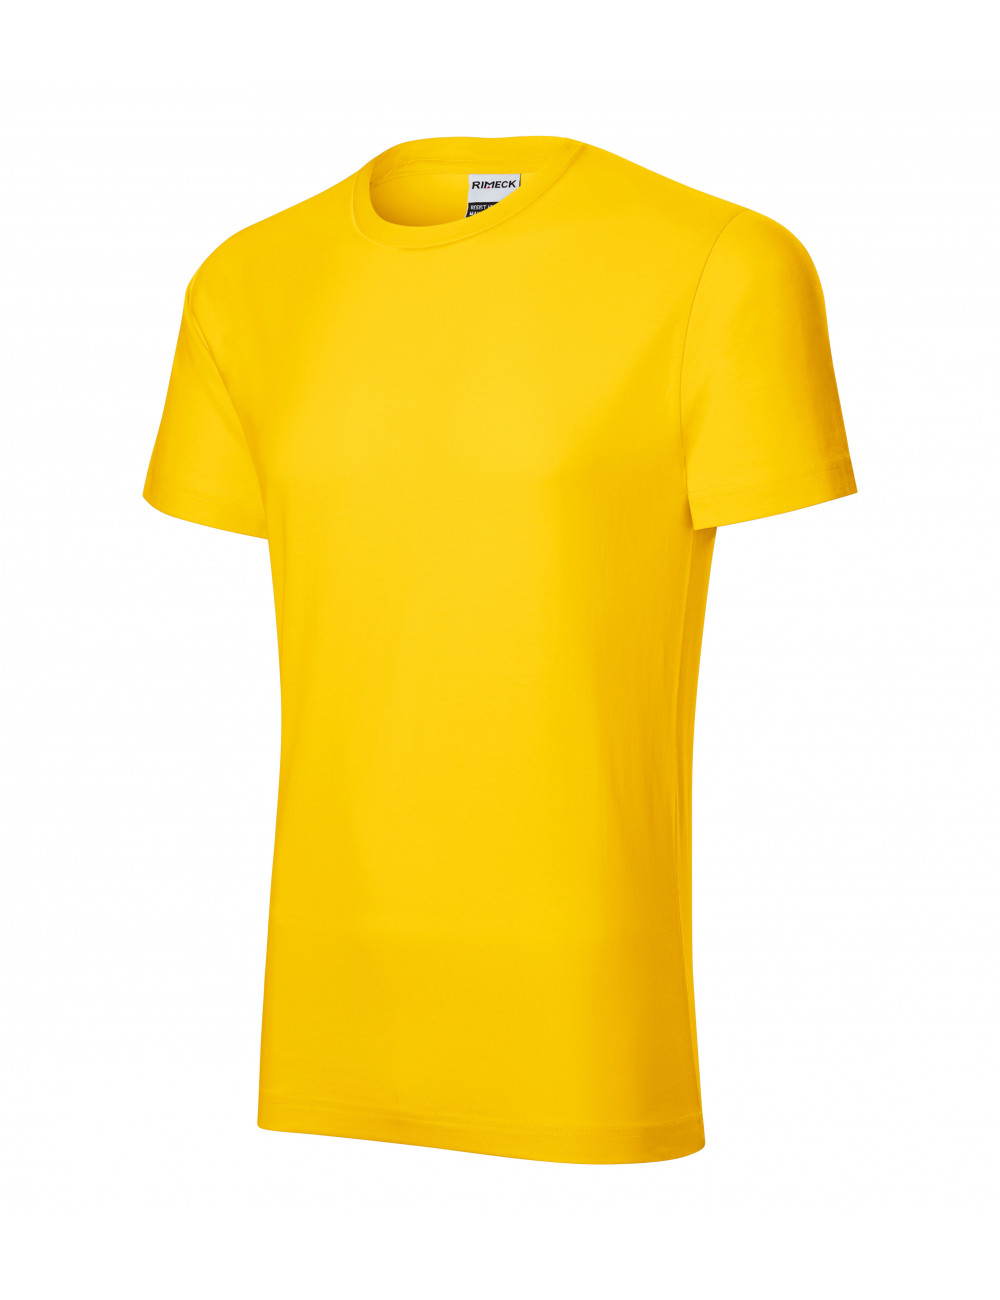 Adler RIMECK Koszulka męska Resist R01 żółty